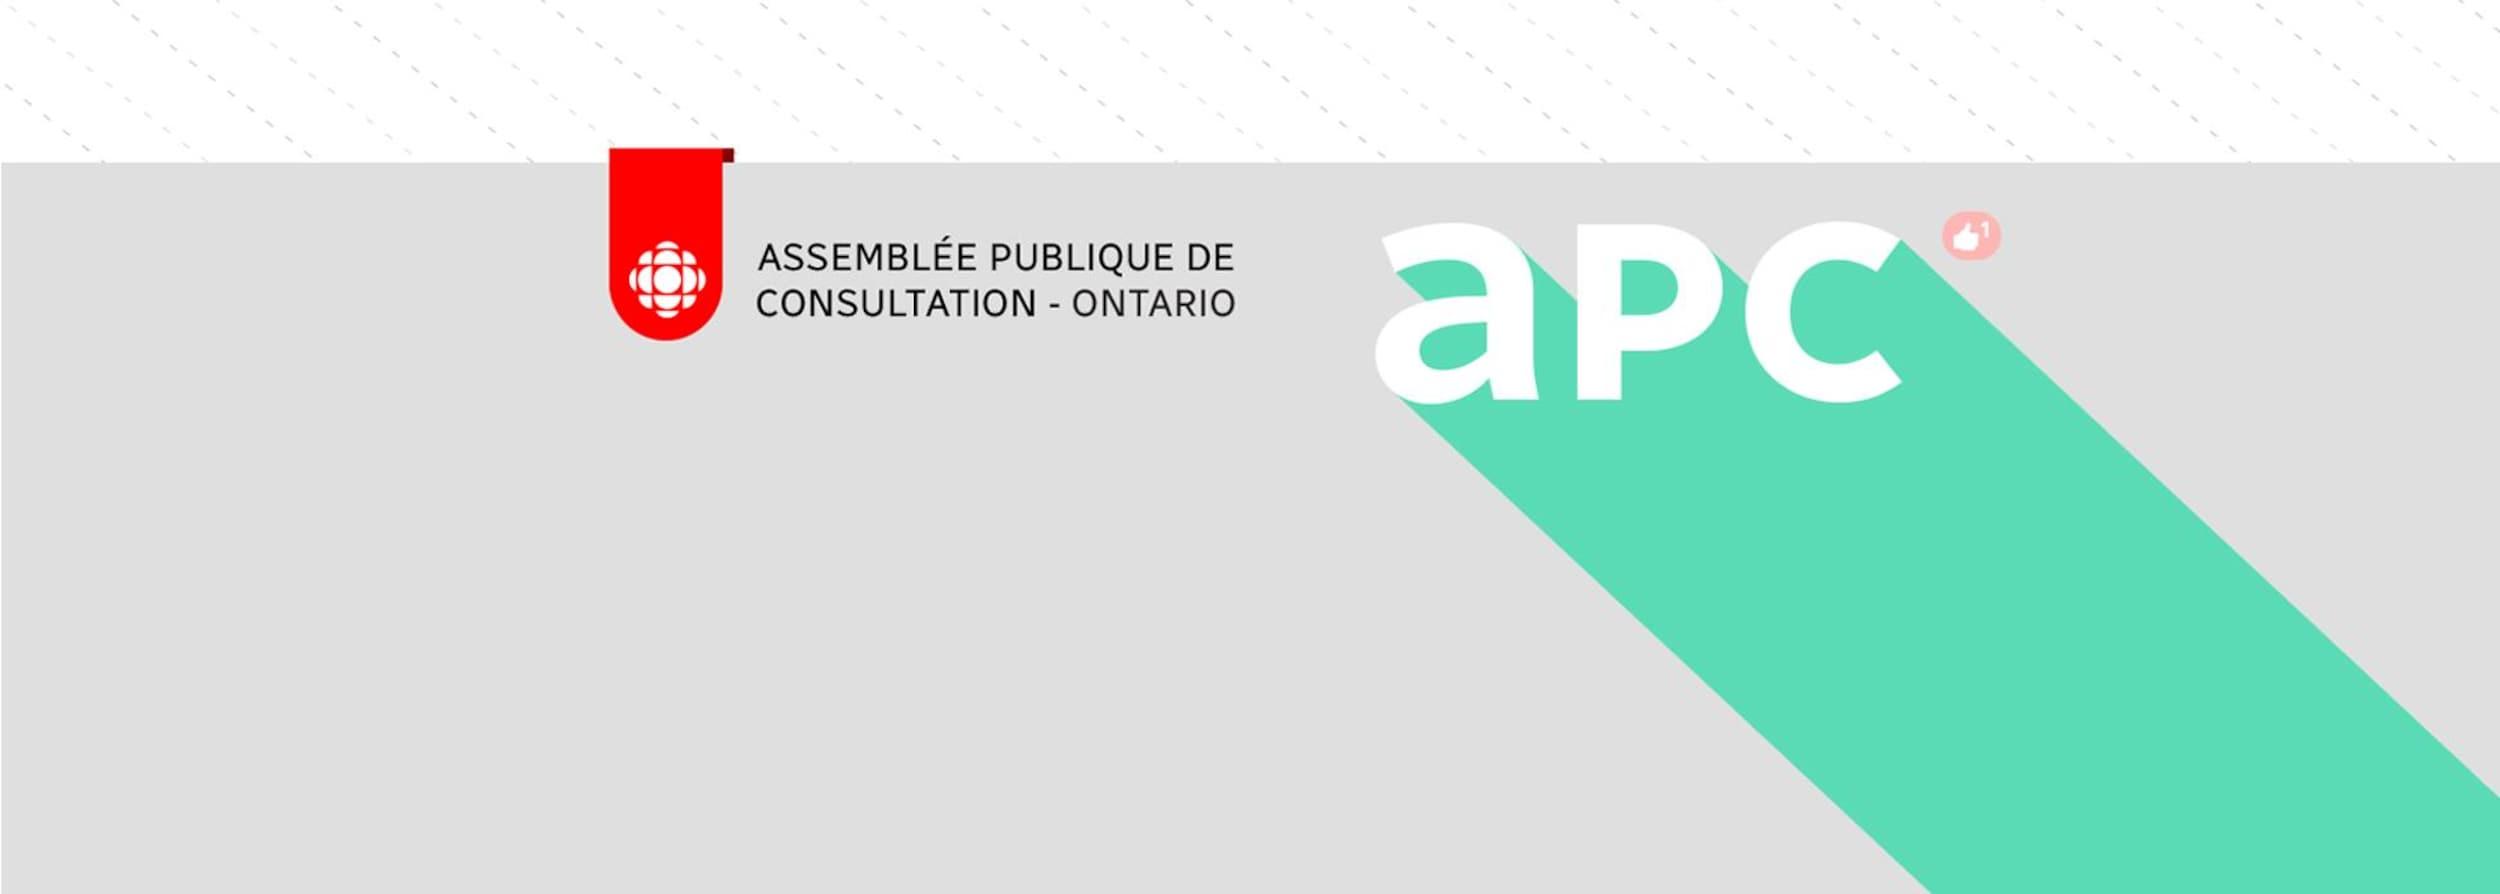 Assemblée publique de consultation - Ontario